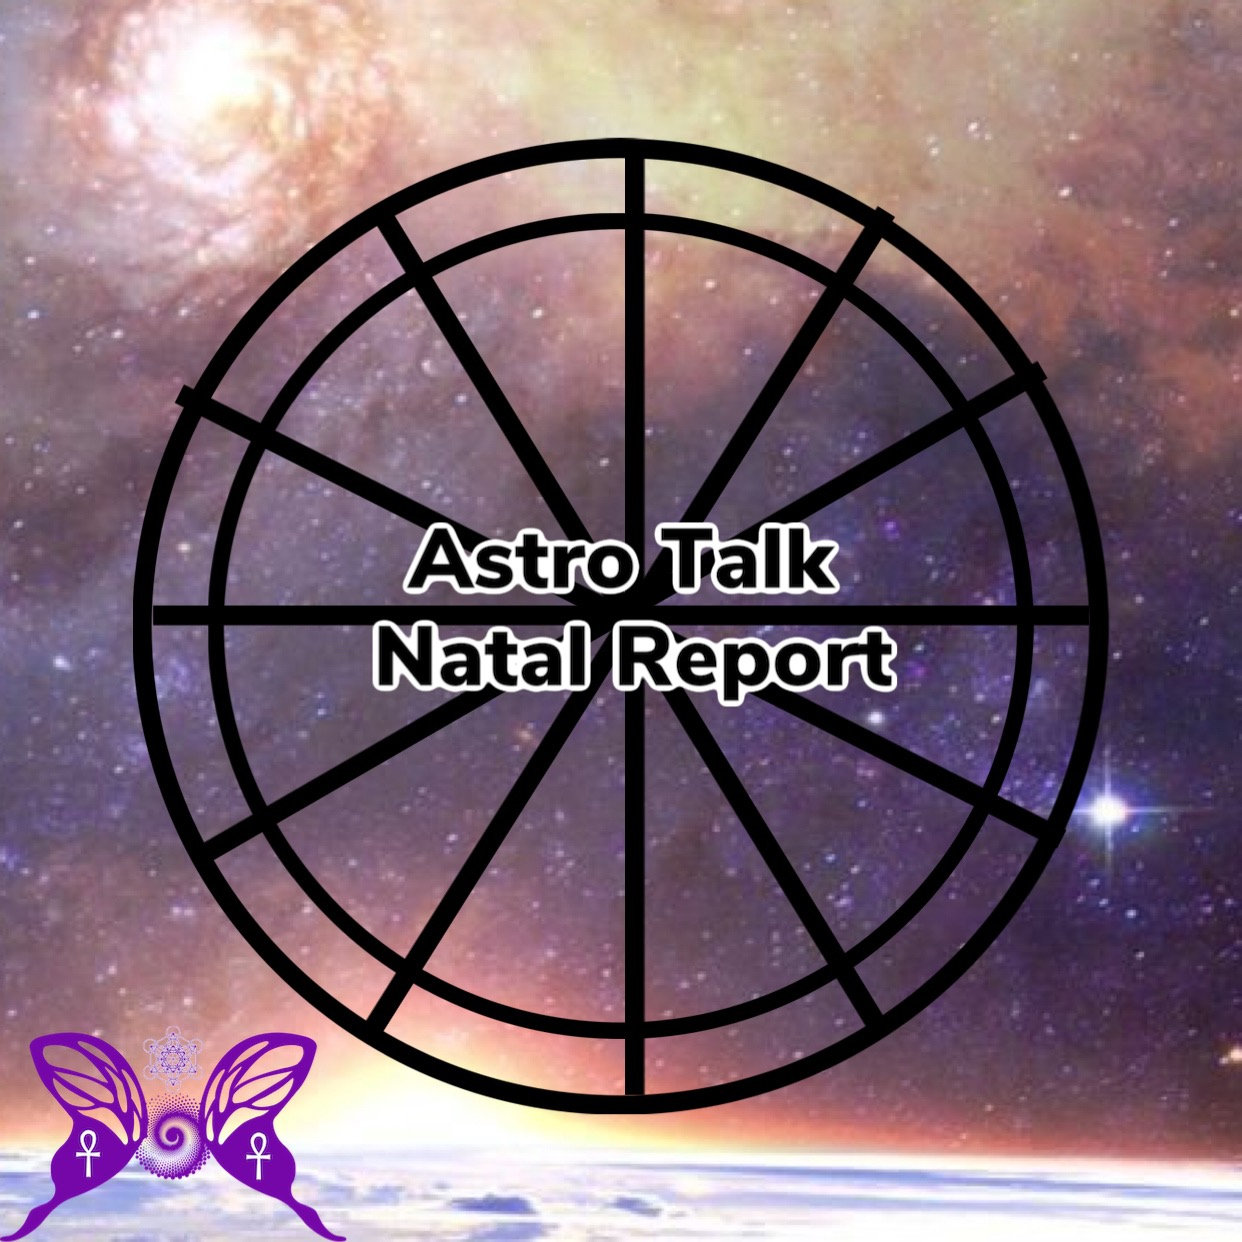 Astro Talk Natal Report